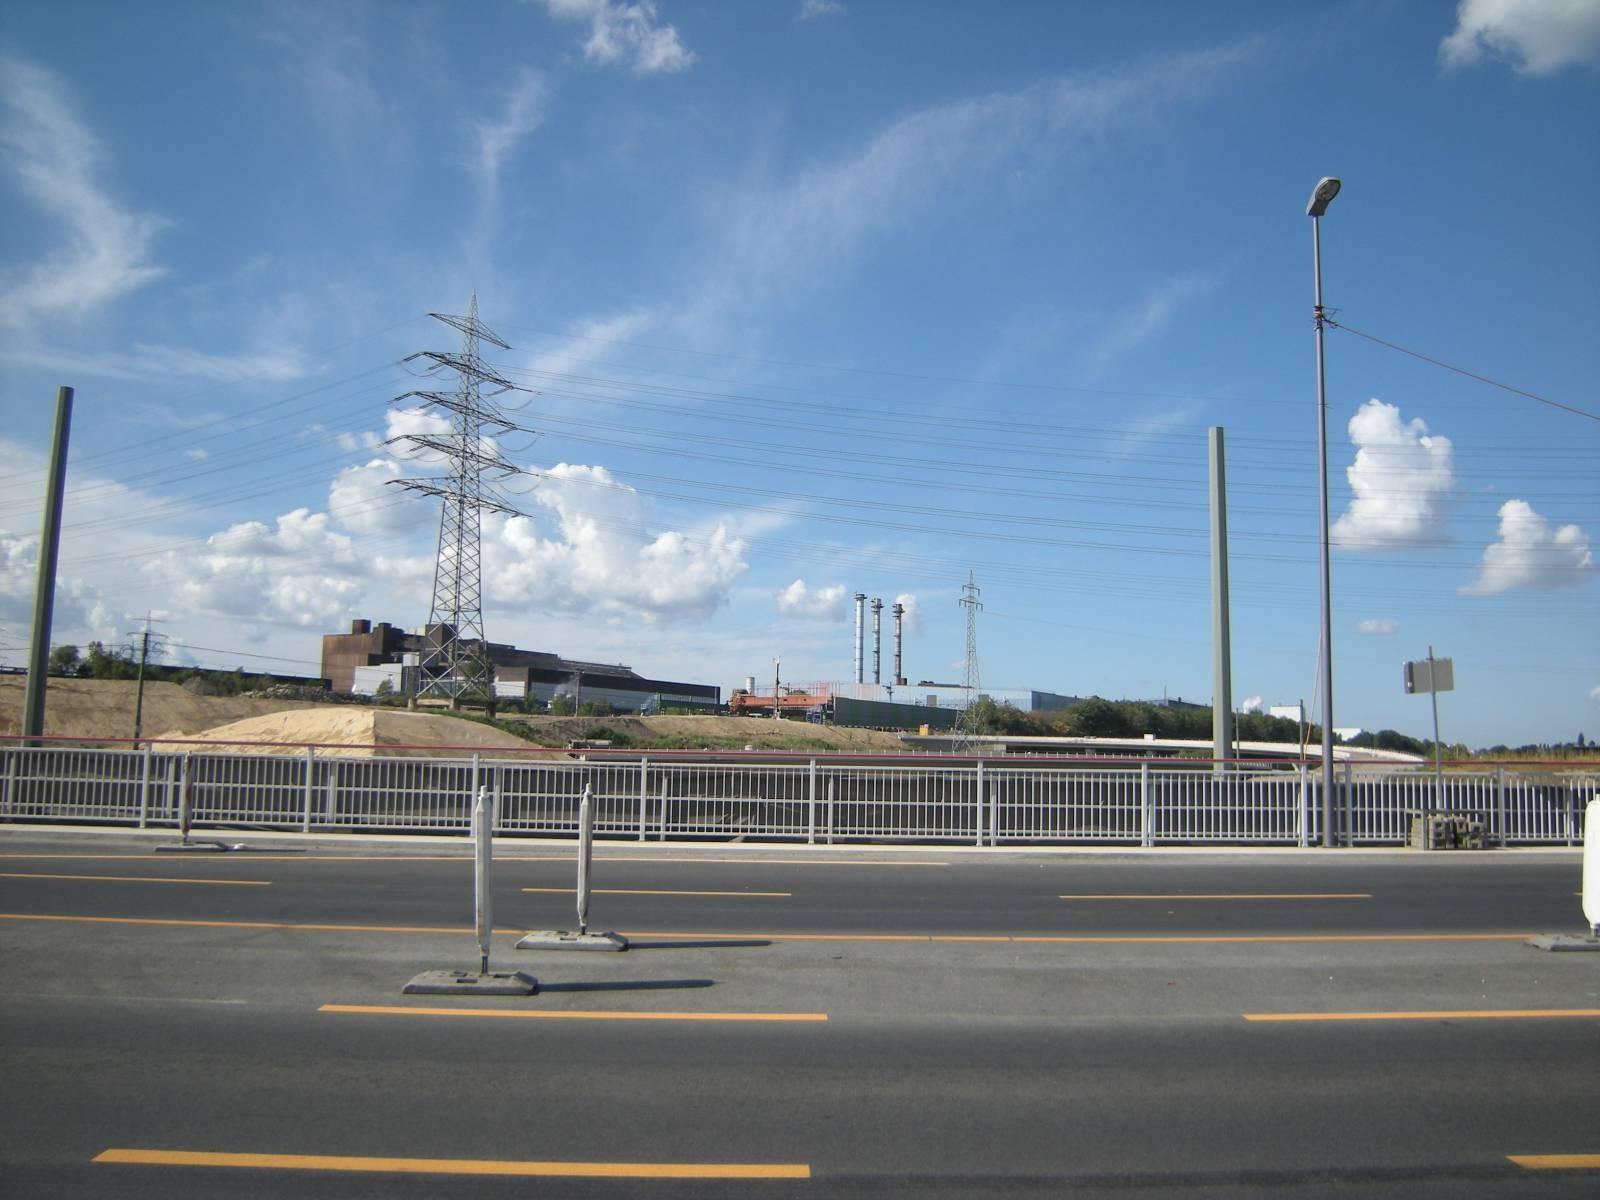 das neue Autobahnkreuz in Bochum